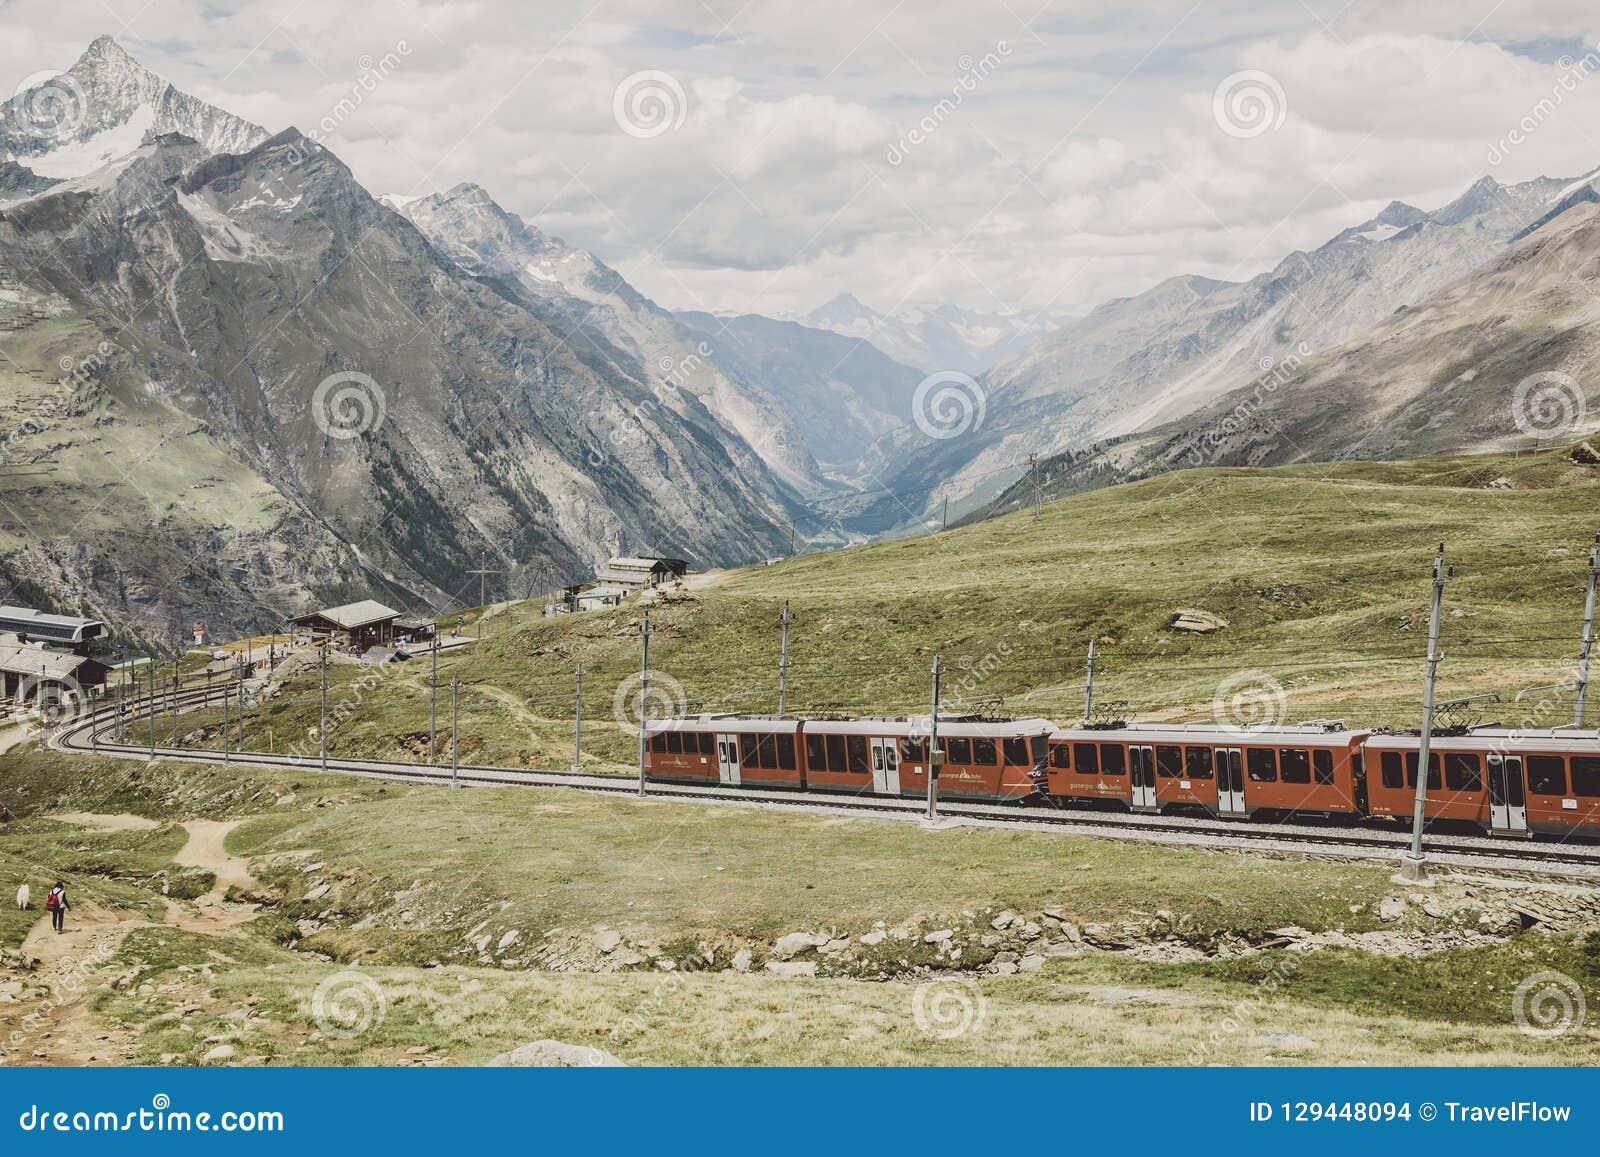 Gornergrat train with tourist is going to Matterhorn mountain